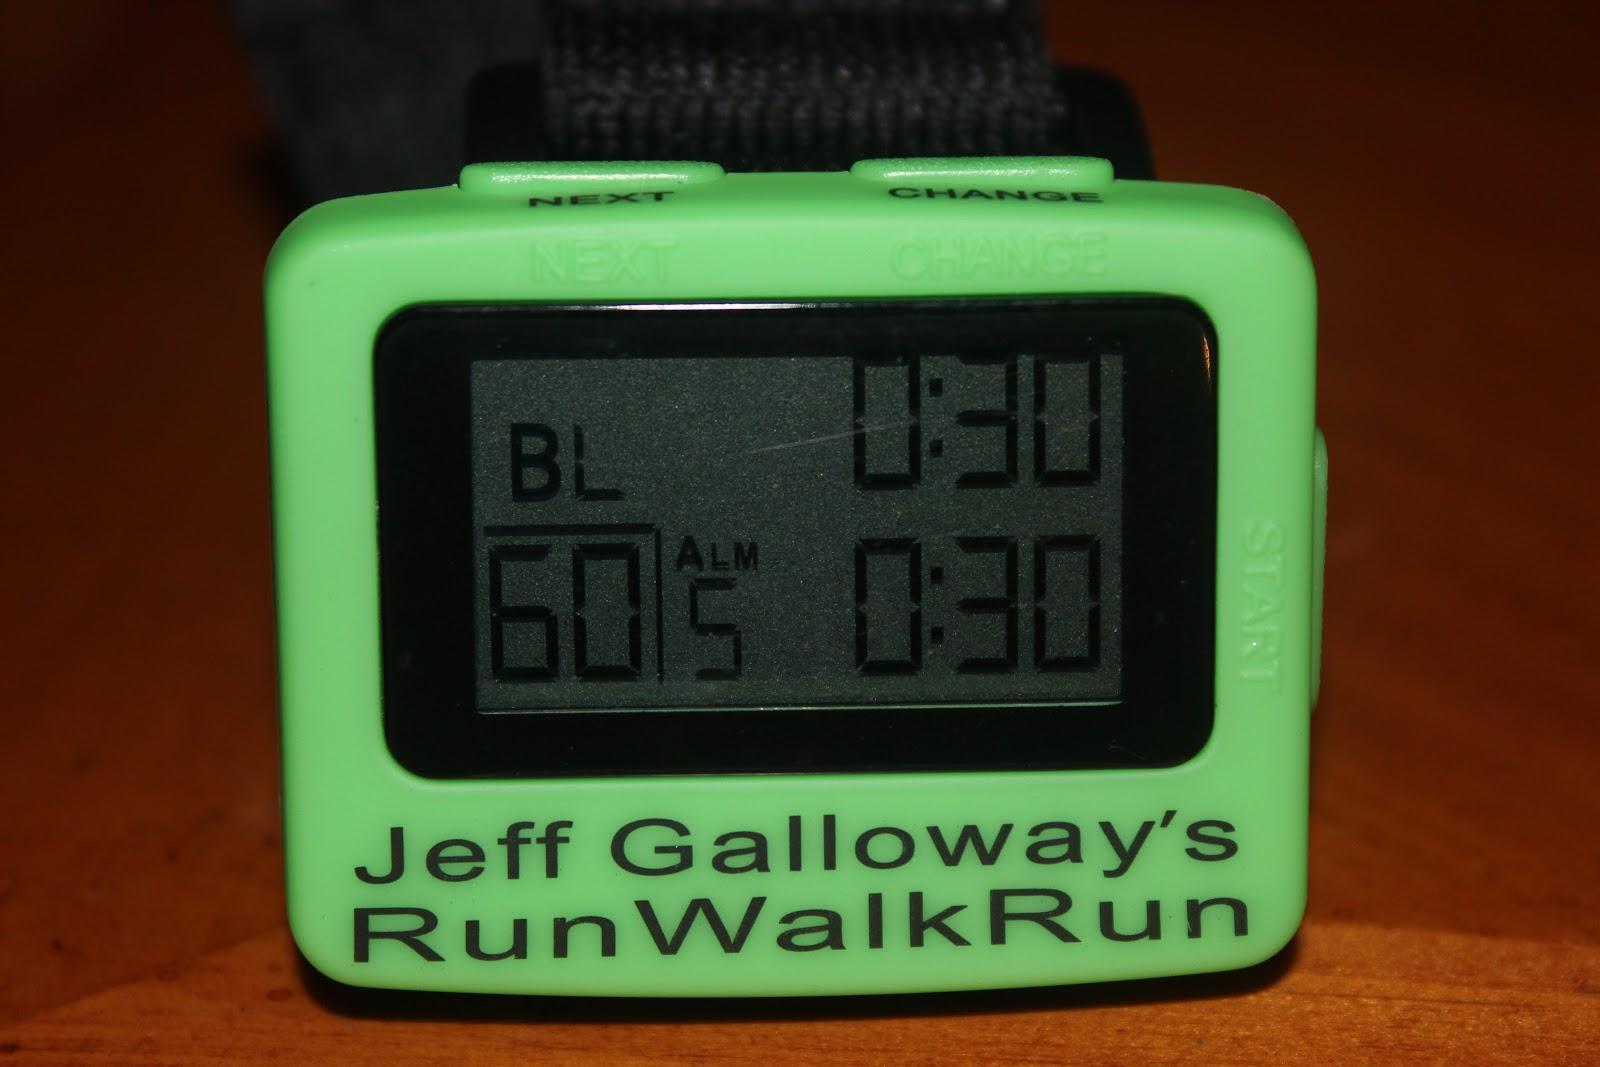 jeff galloway run walk run timer instructions